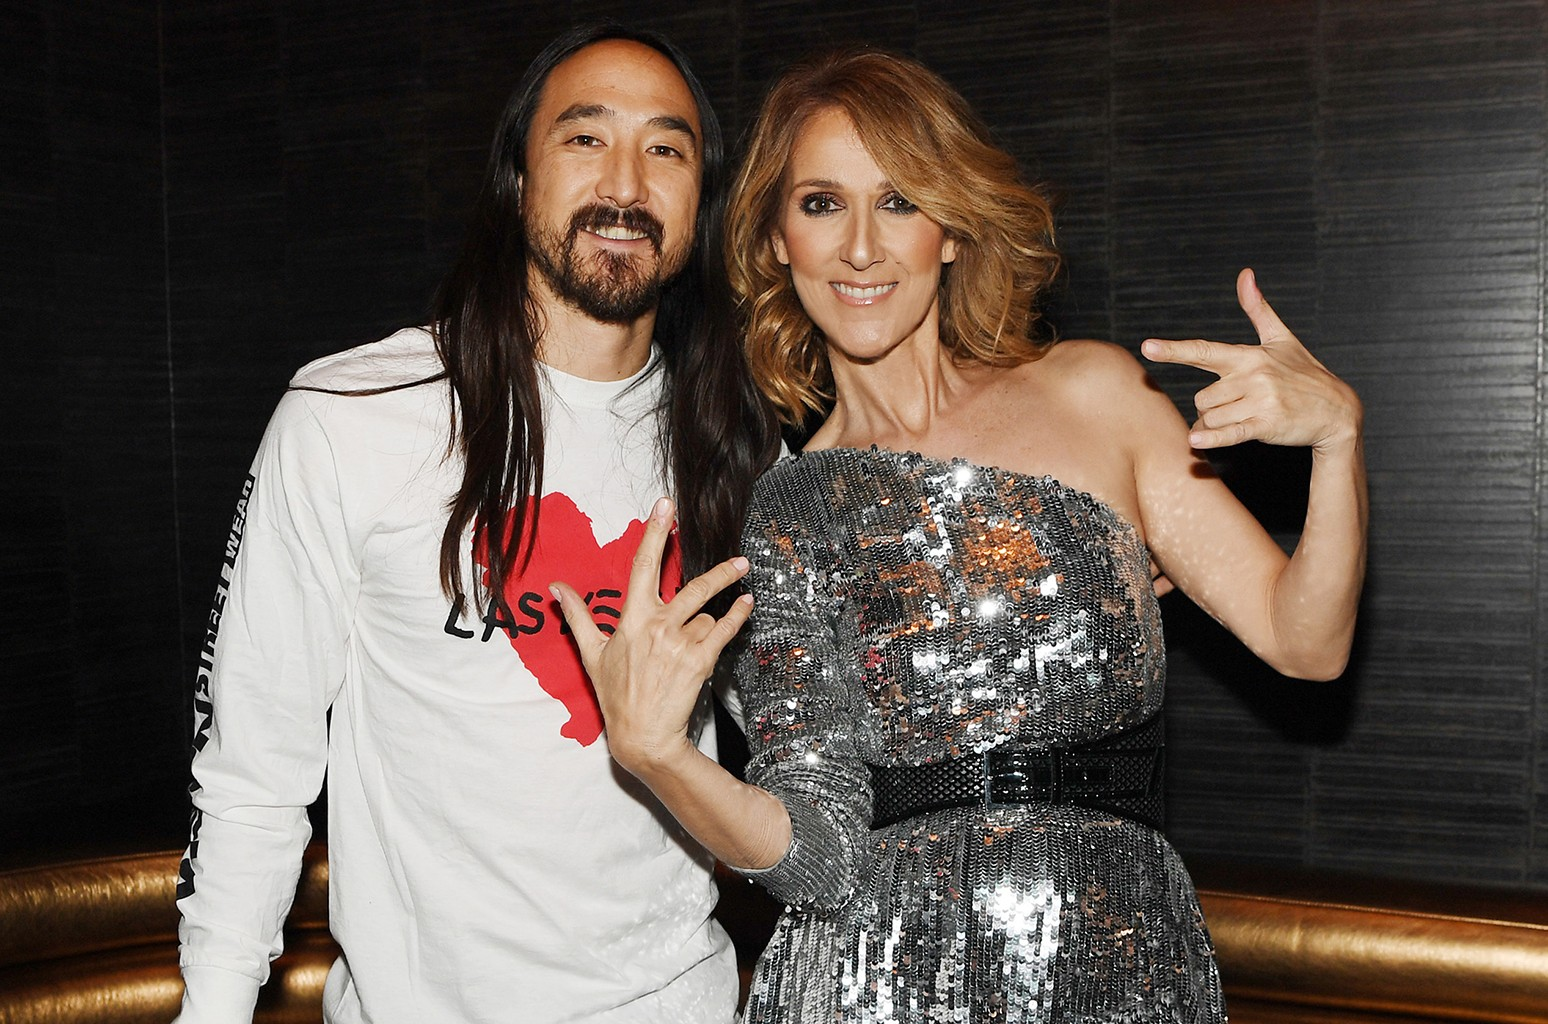 Steve Aoki and Celine Dion